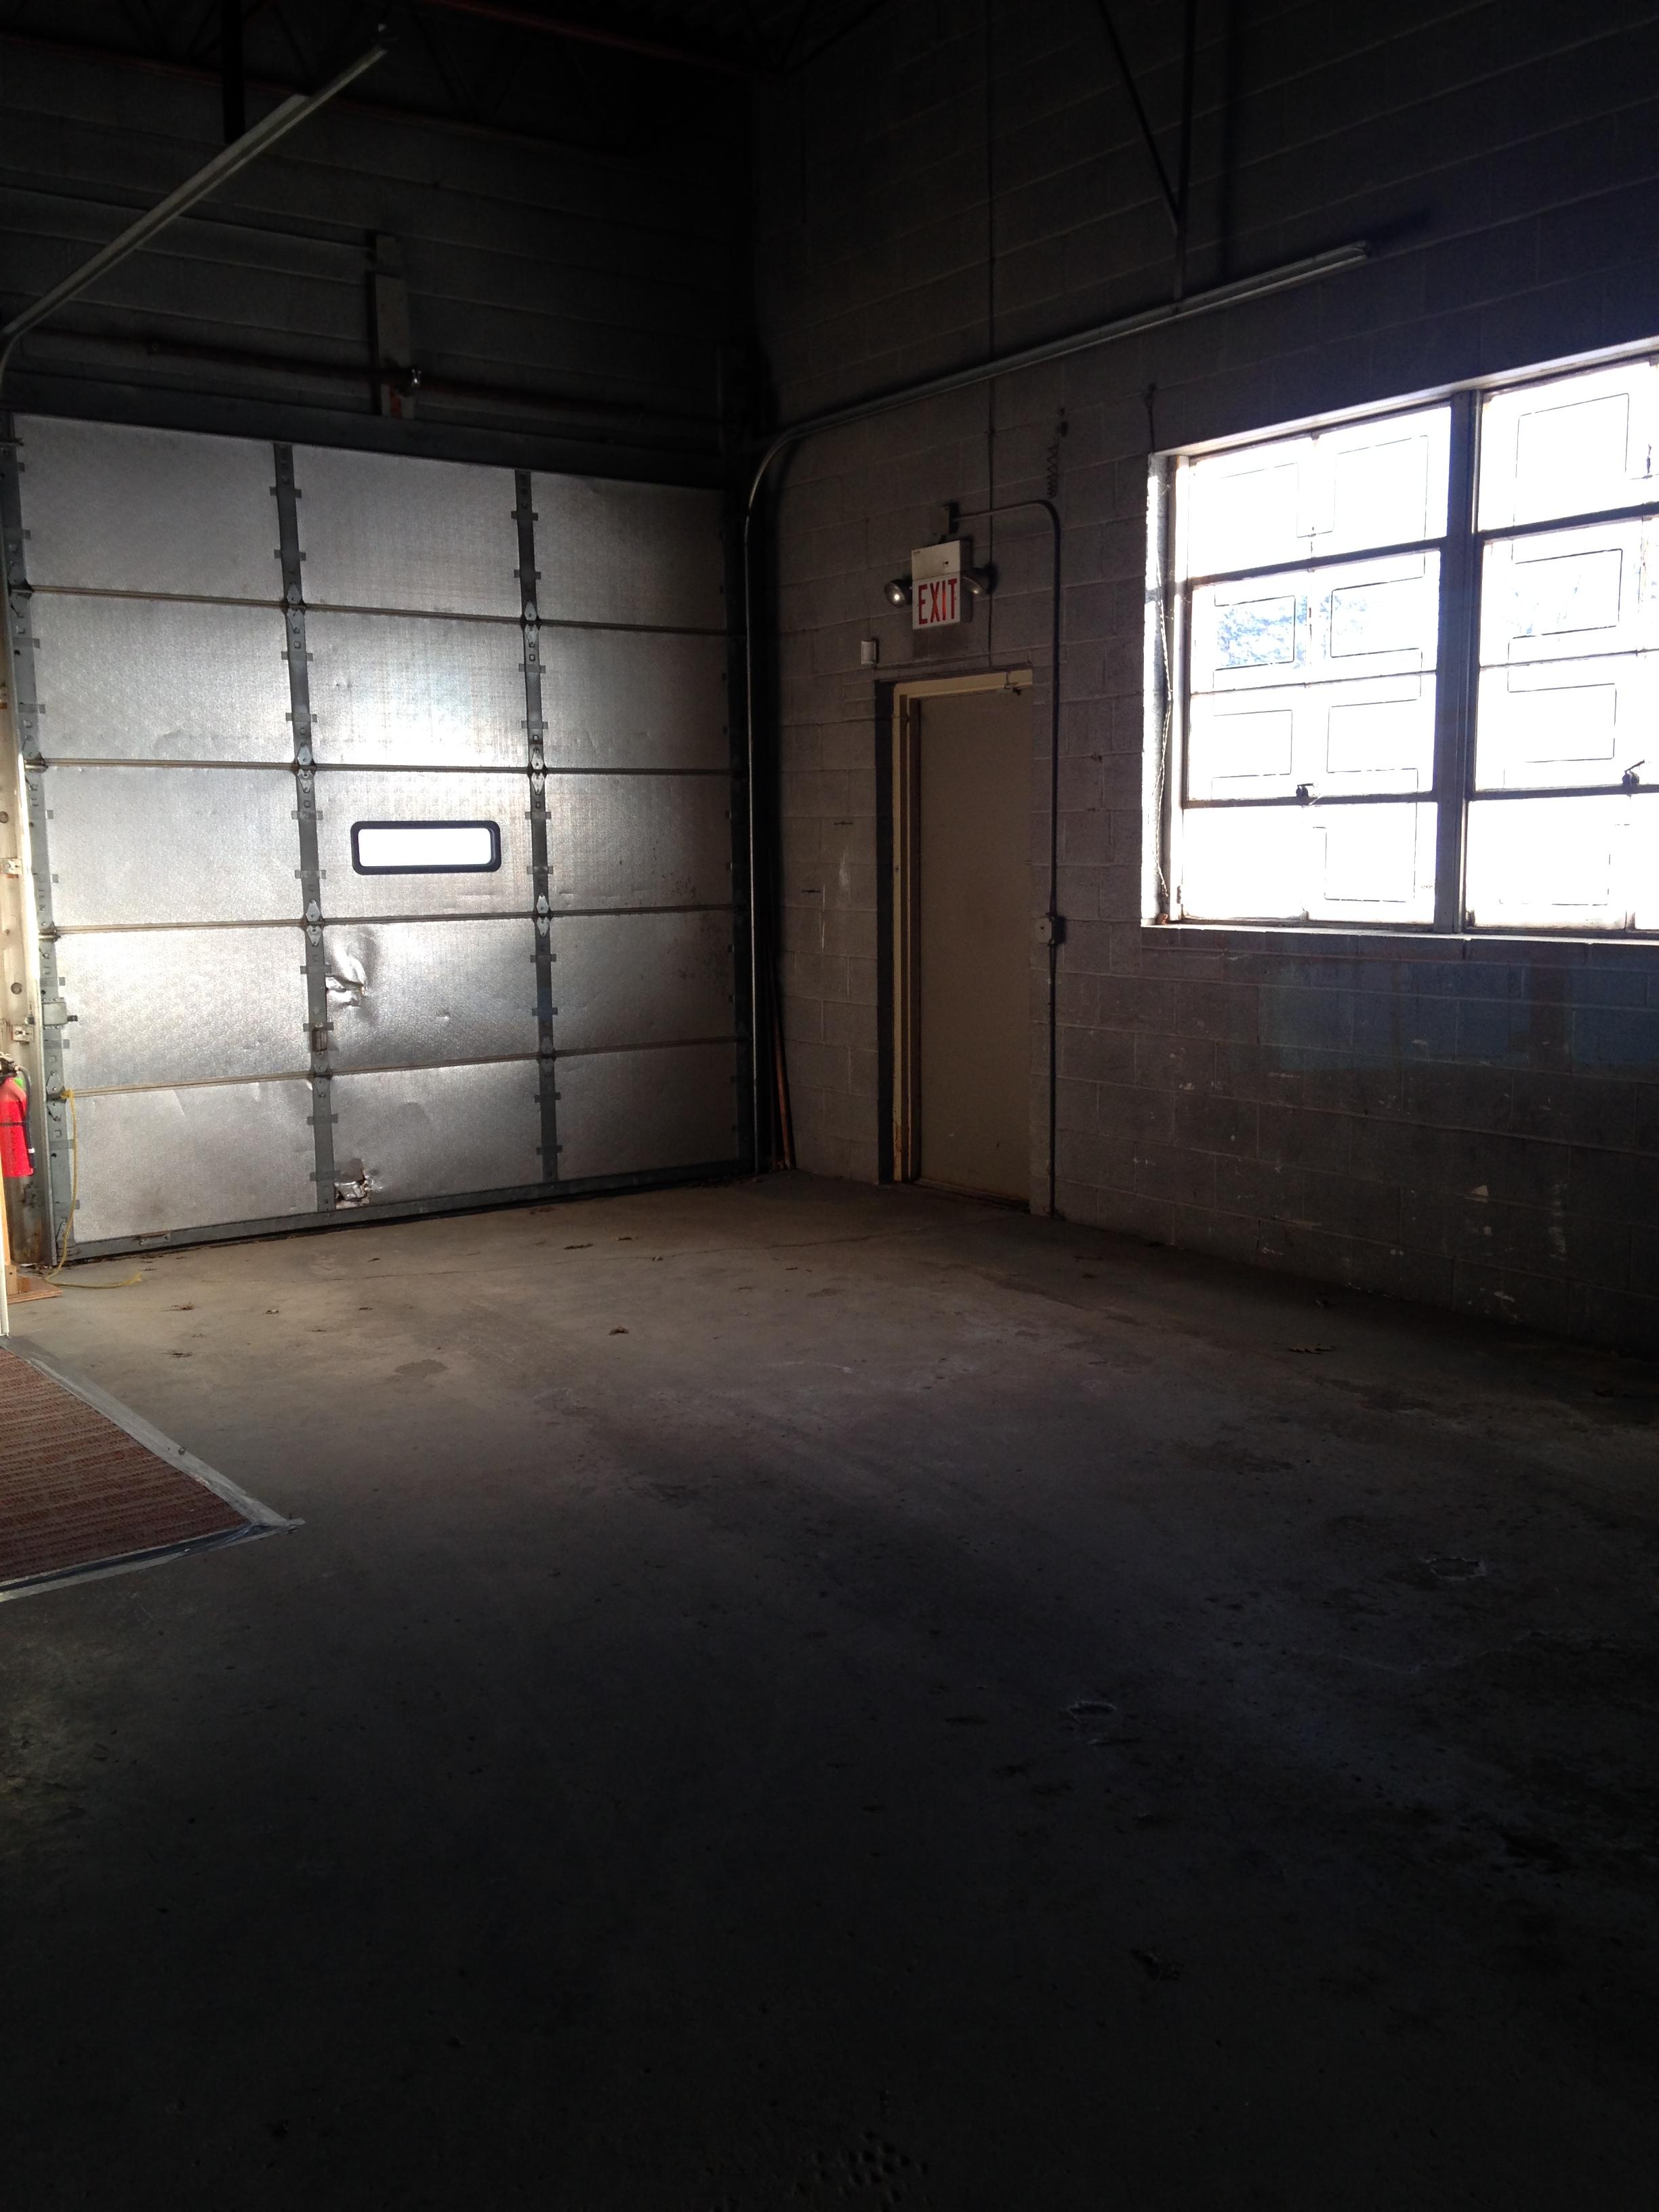 Designer Walls Warehouse Interior 4